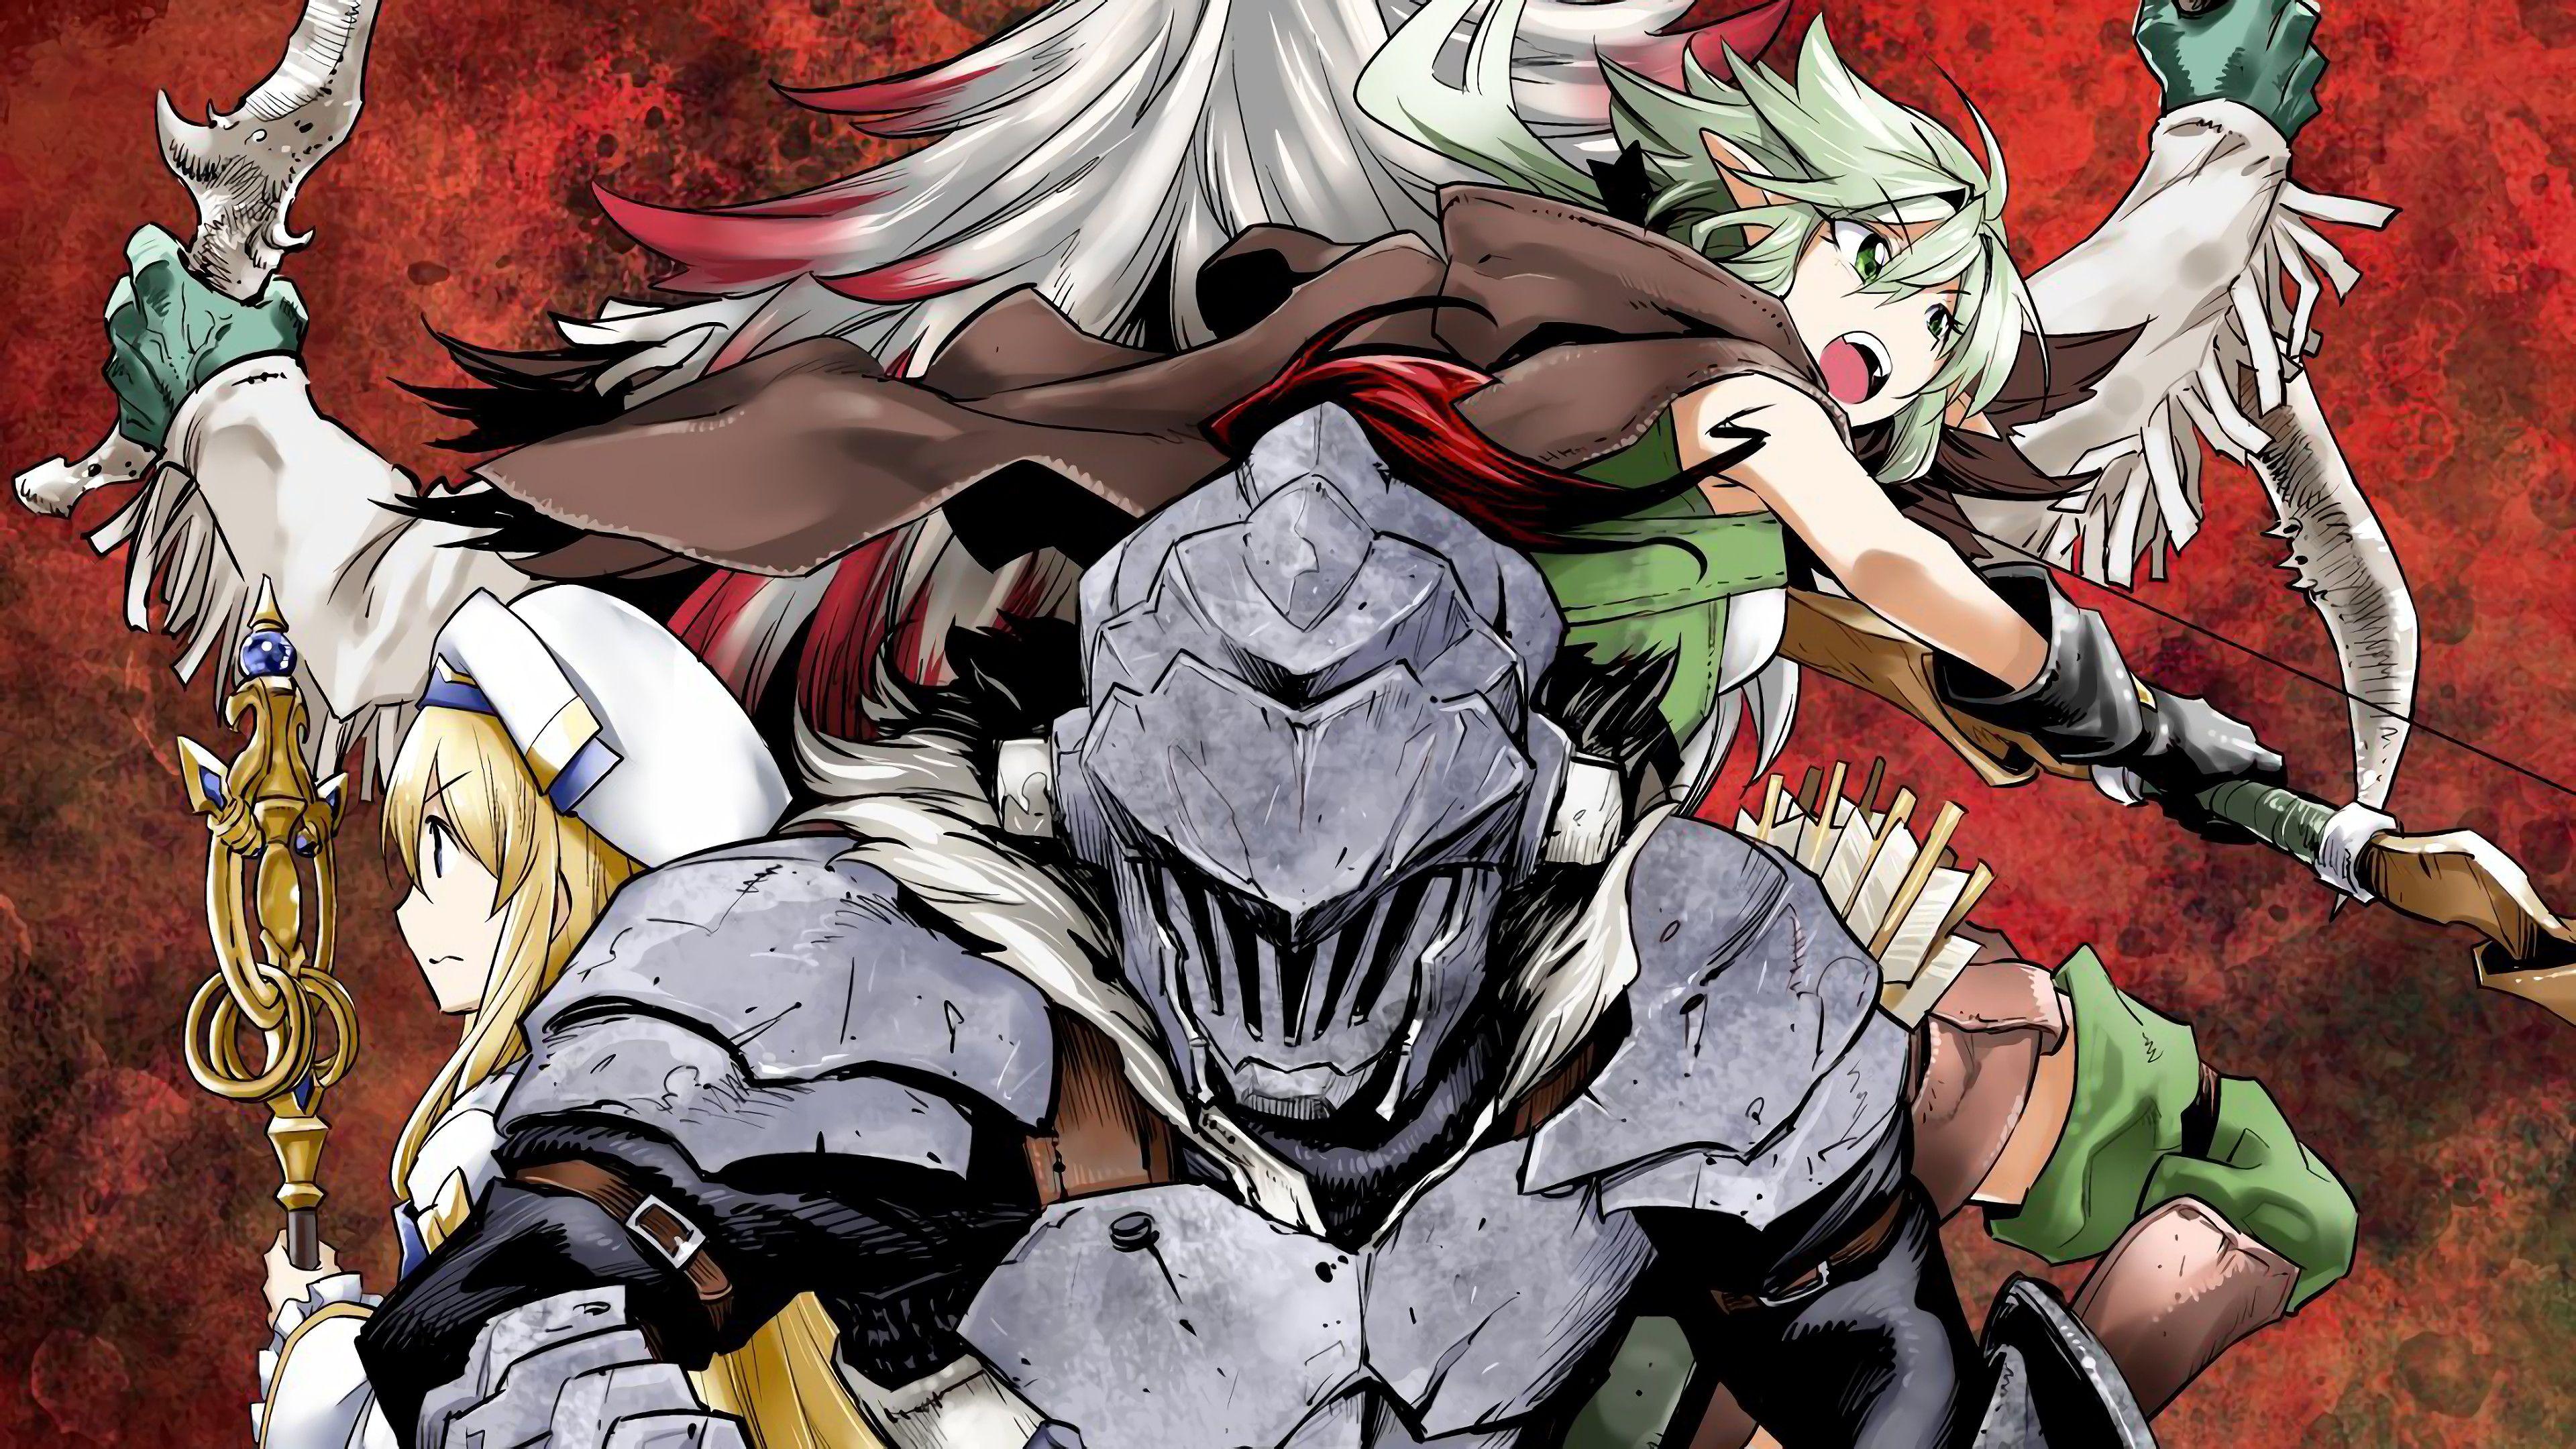 Goblin Slayer Priestess High Elf Archer 4k 25019 Goblin Hd Anime Wallpapers Slayer Anime